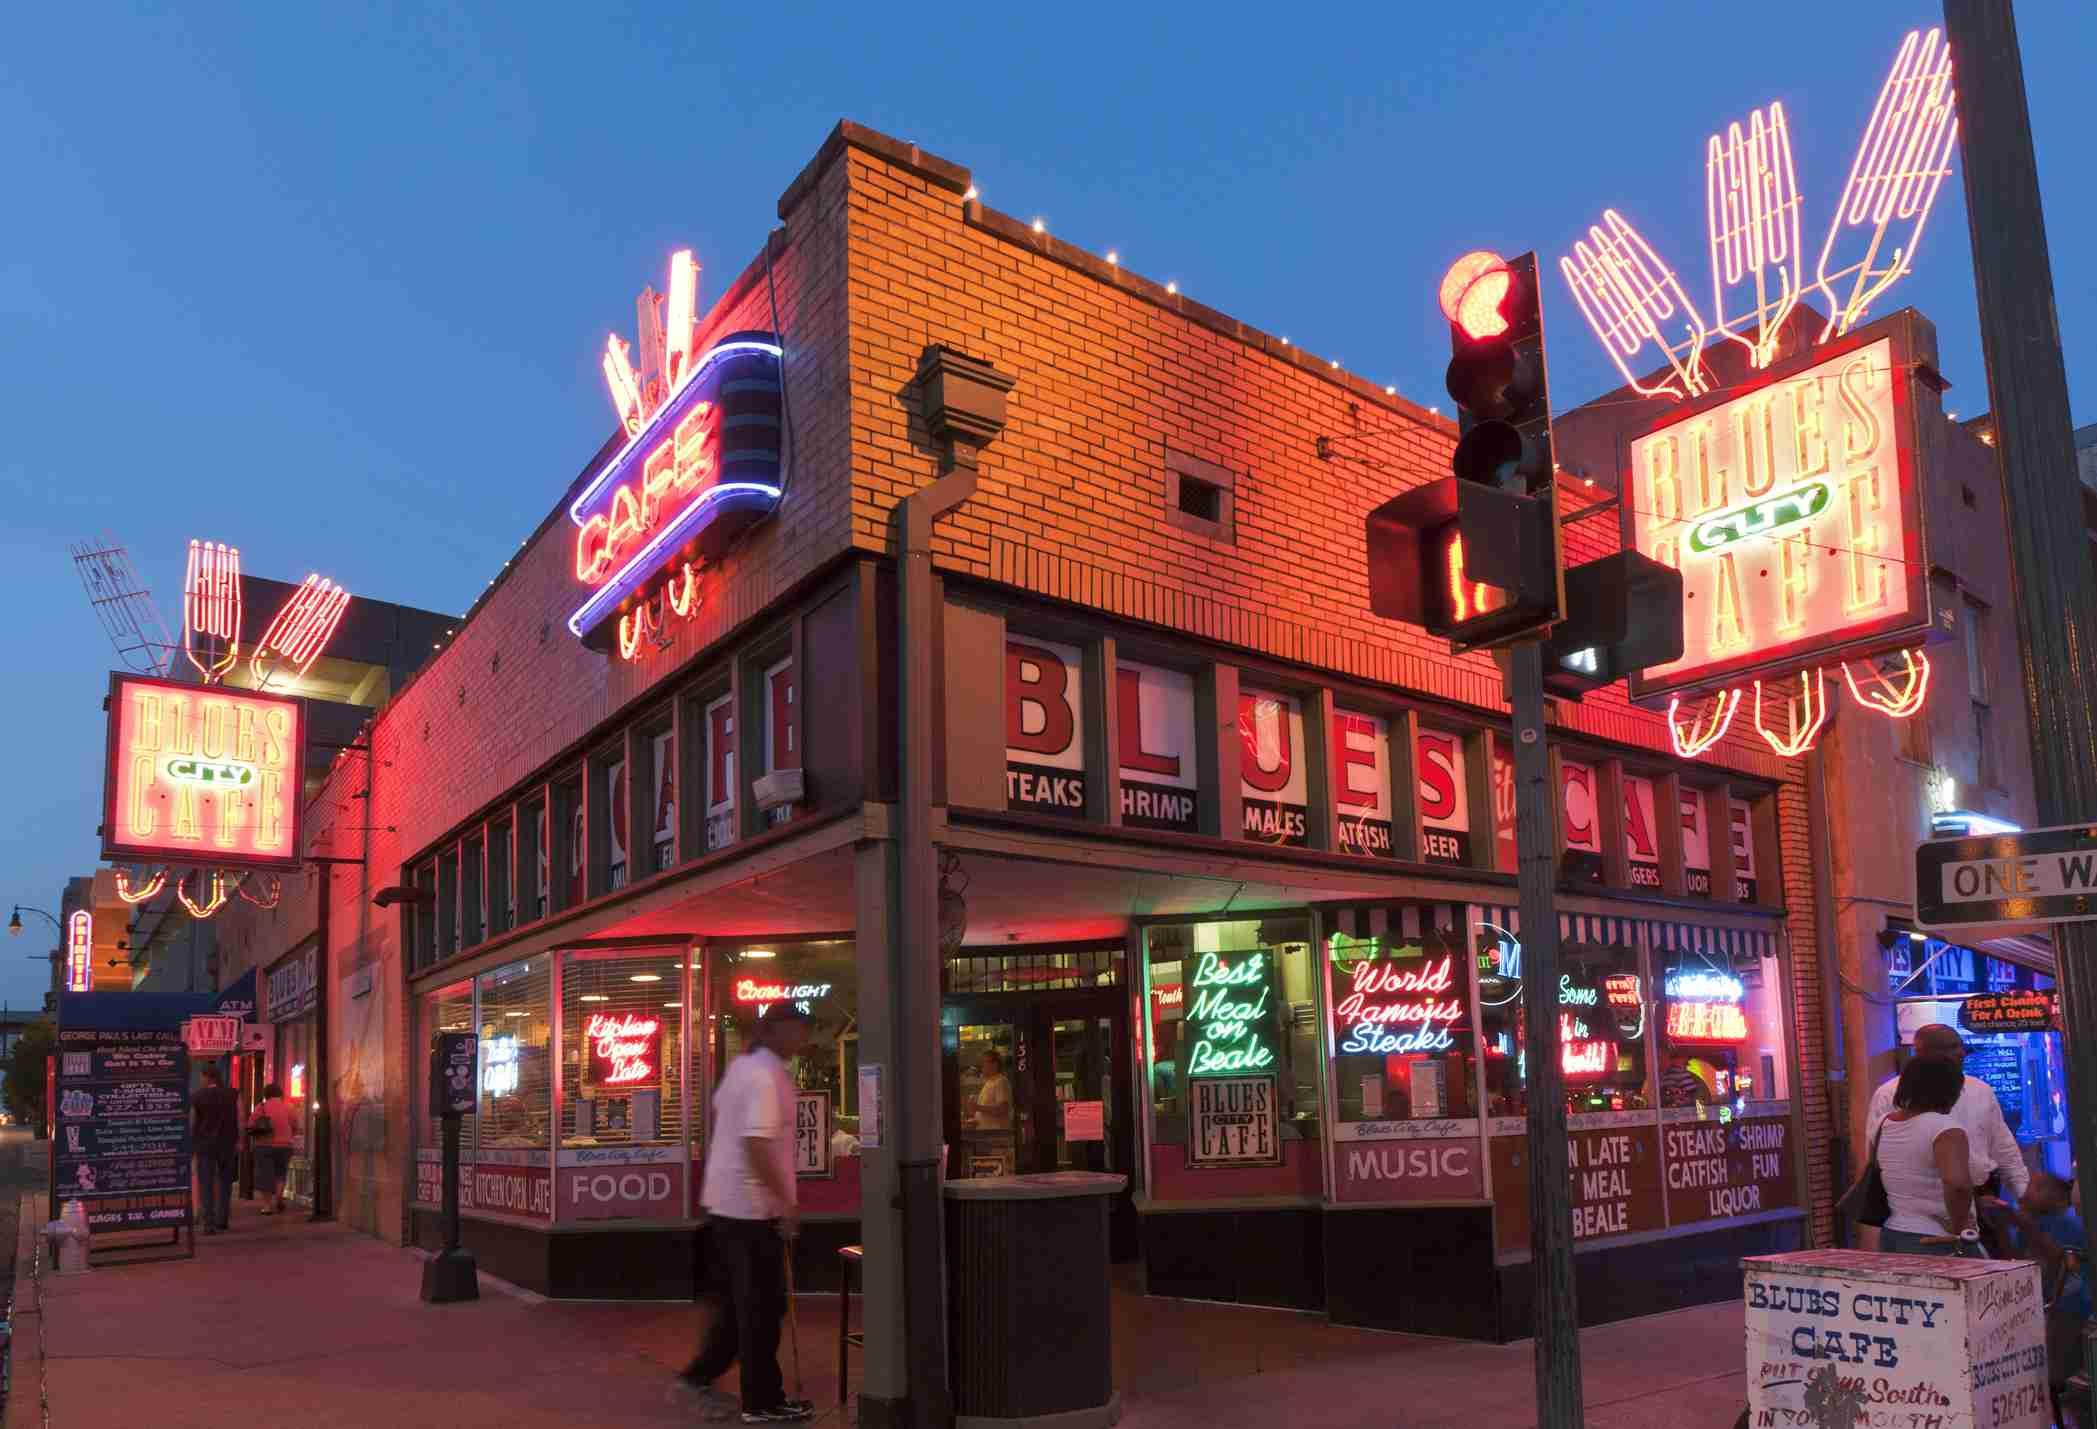 Blues City Cafe restaurant on Beale Street.